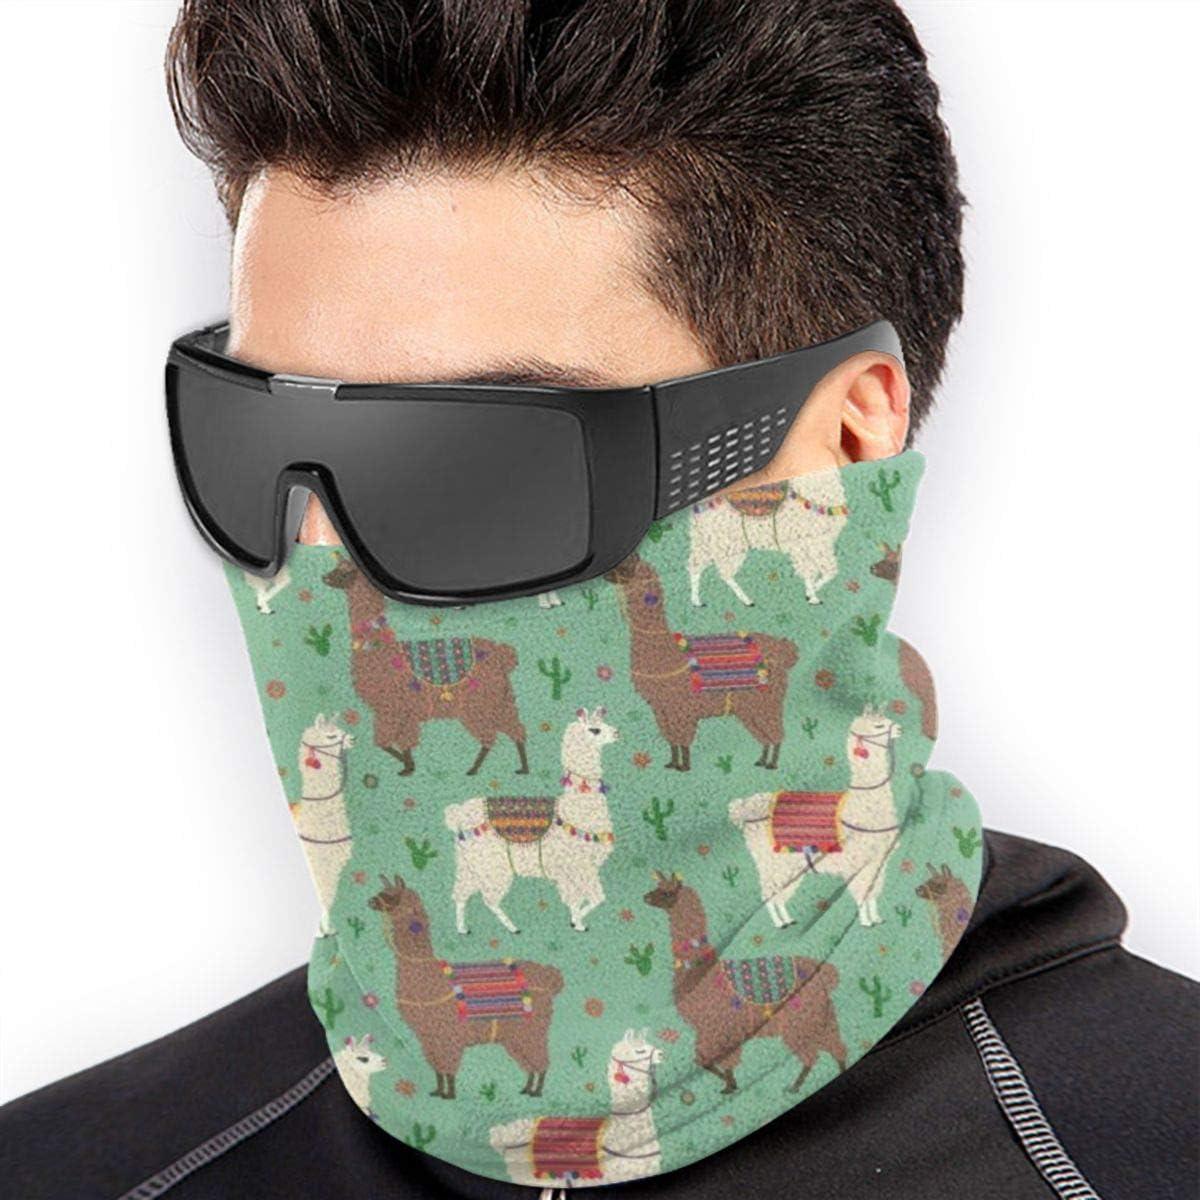 Scarf Fleece Neck Warmer Mexican Llama Alpaca Cactus Windproof Winter Neck Gaiter Cold Weather Face Mask for Men Women